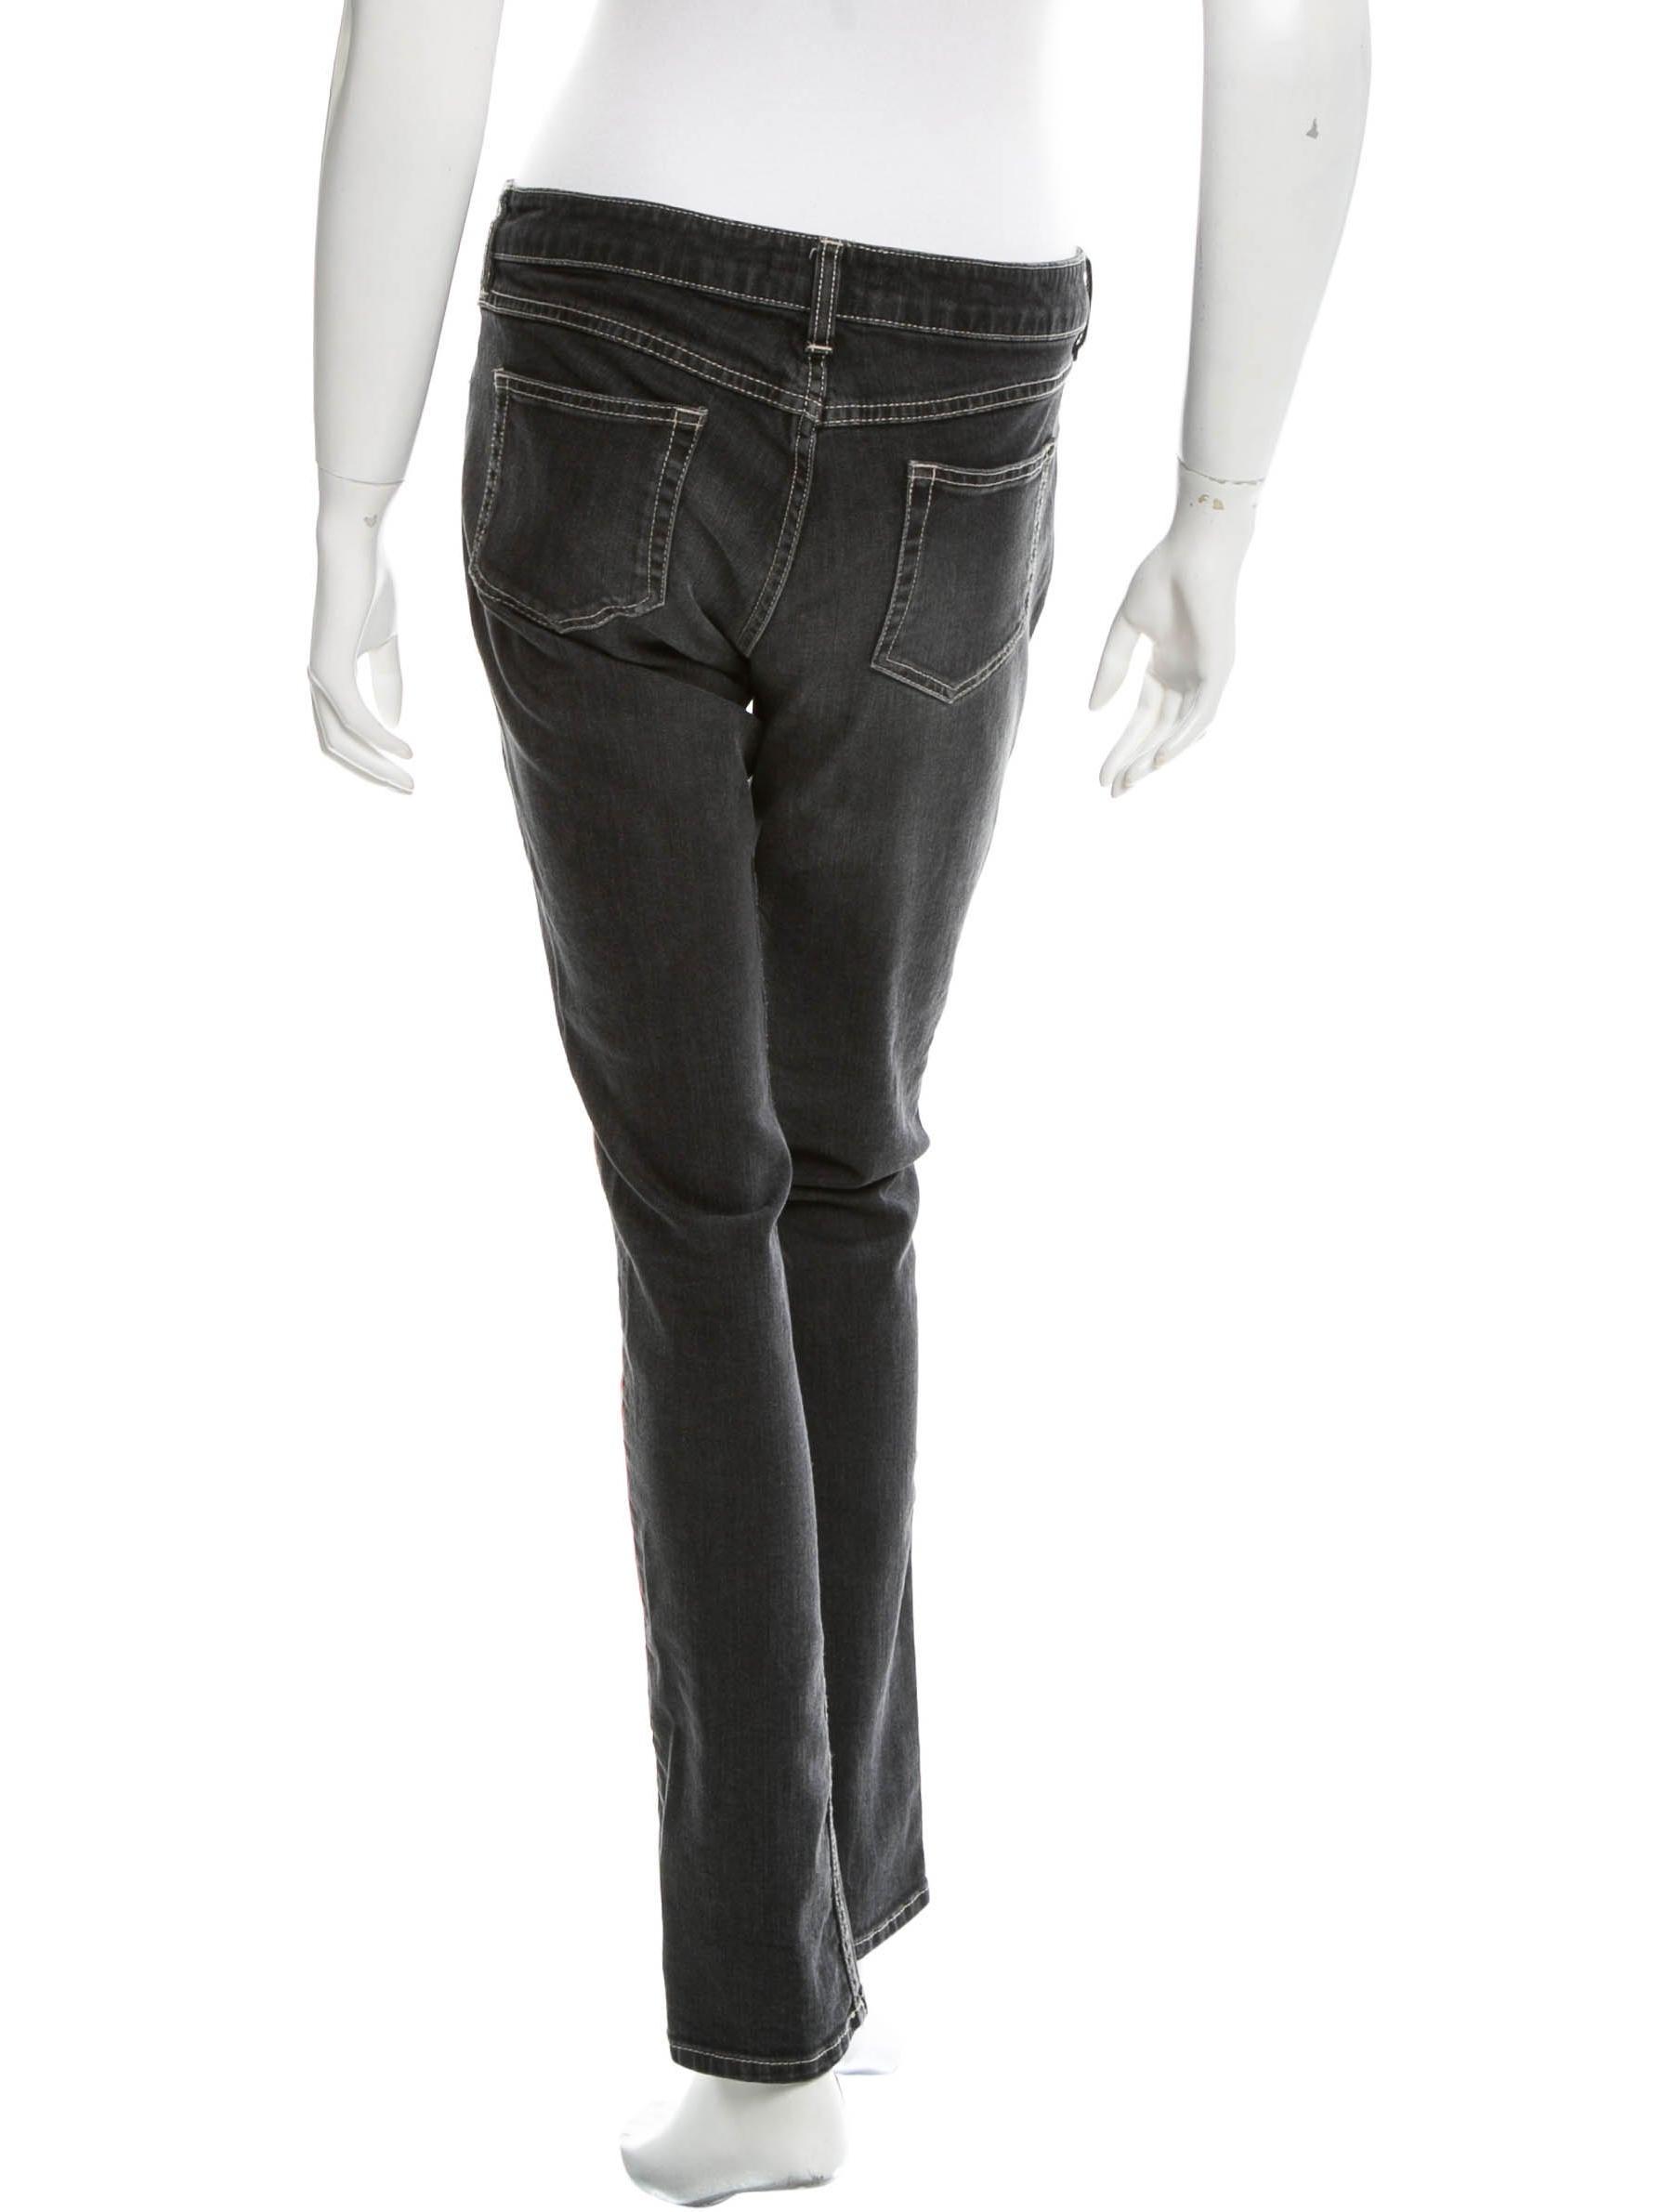 Étoile isabel marant embroidered straight leg jeans